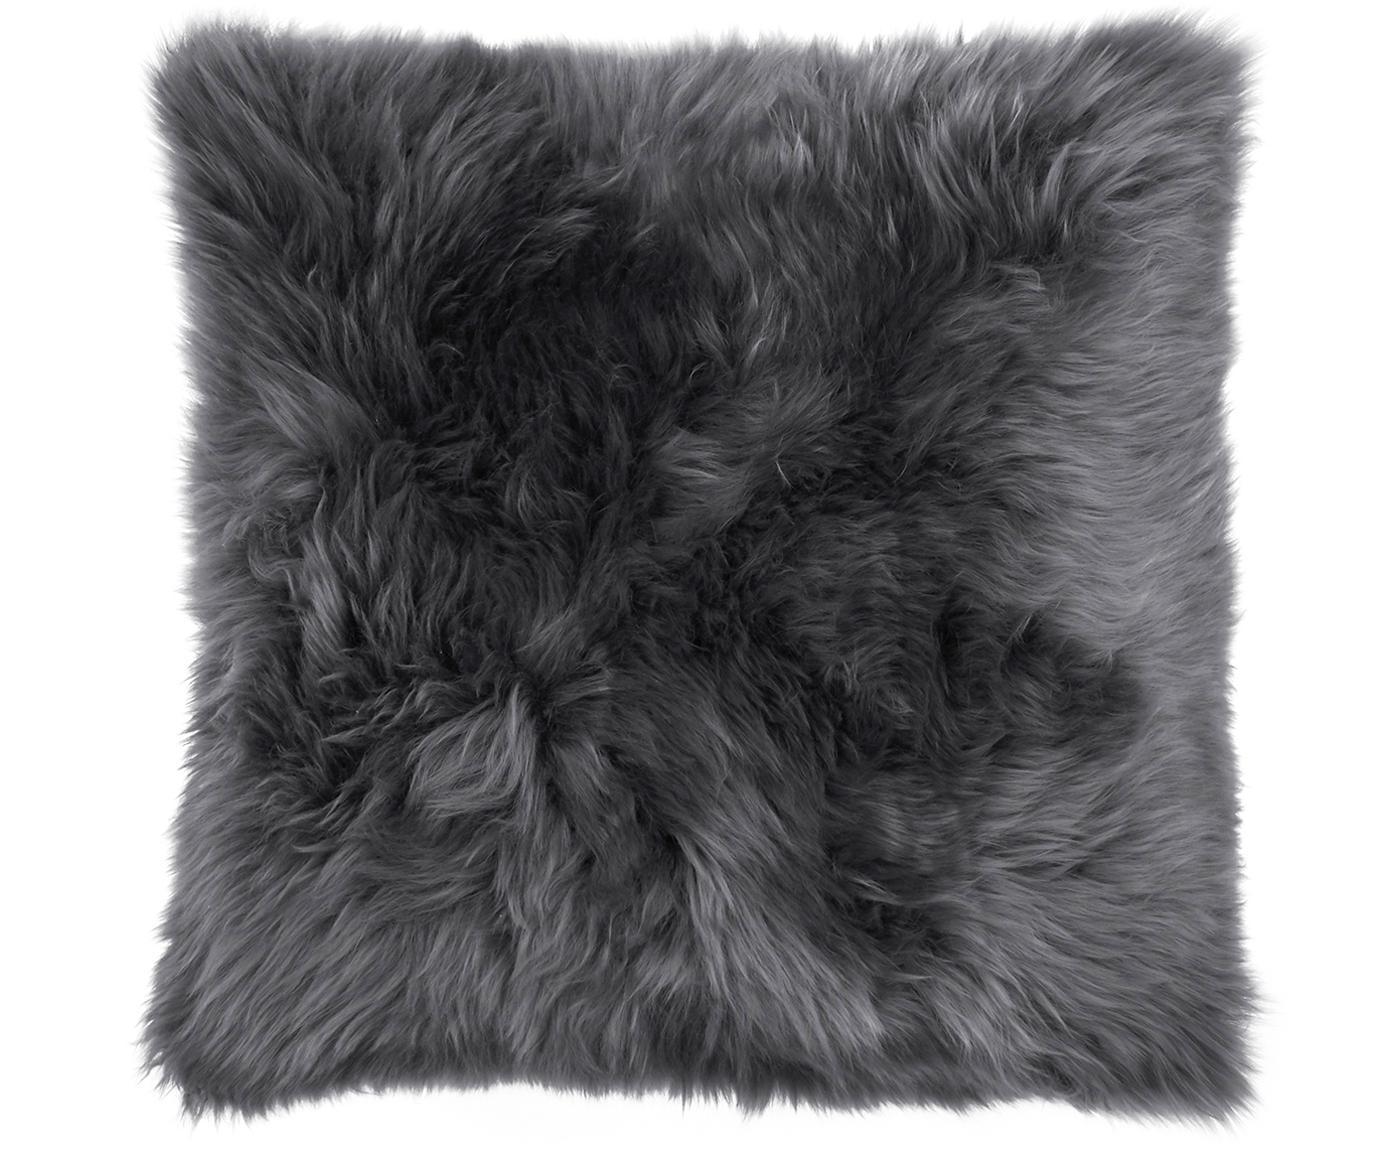 Schaffell-Kissenhülle Oslo, glatt, Vorderseite: 100% Schaffell, Rückseite: Leinen, Vorderseite: Dunkelgrau Rückseite: Dunkelgrau, 40 x 40 cm